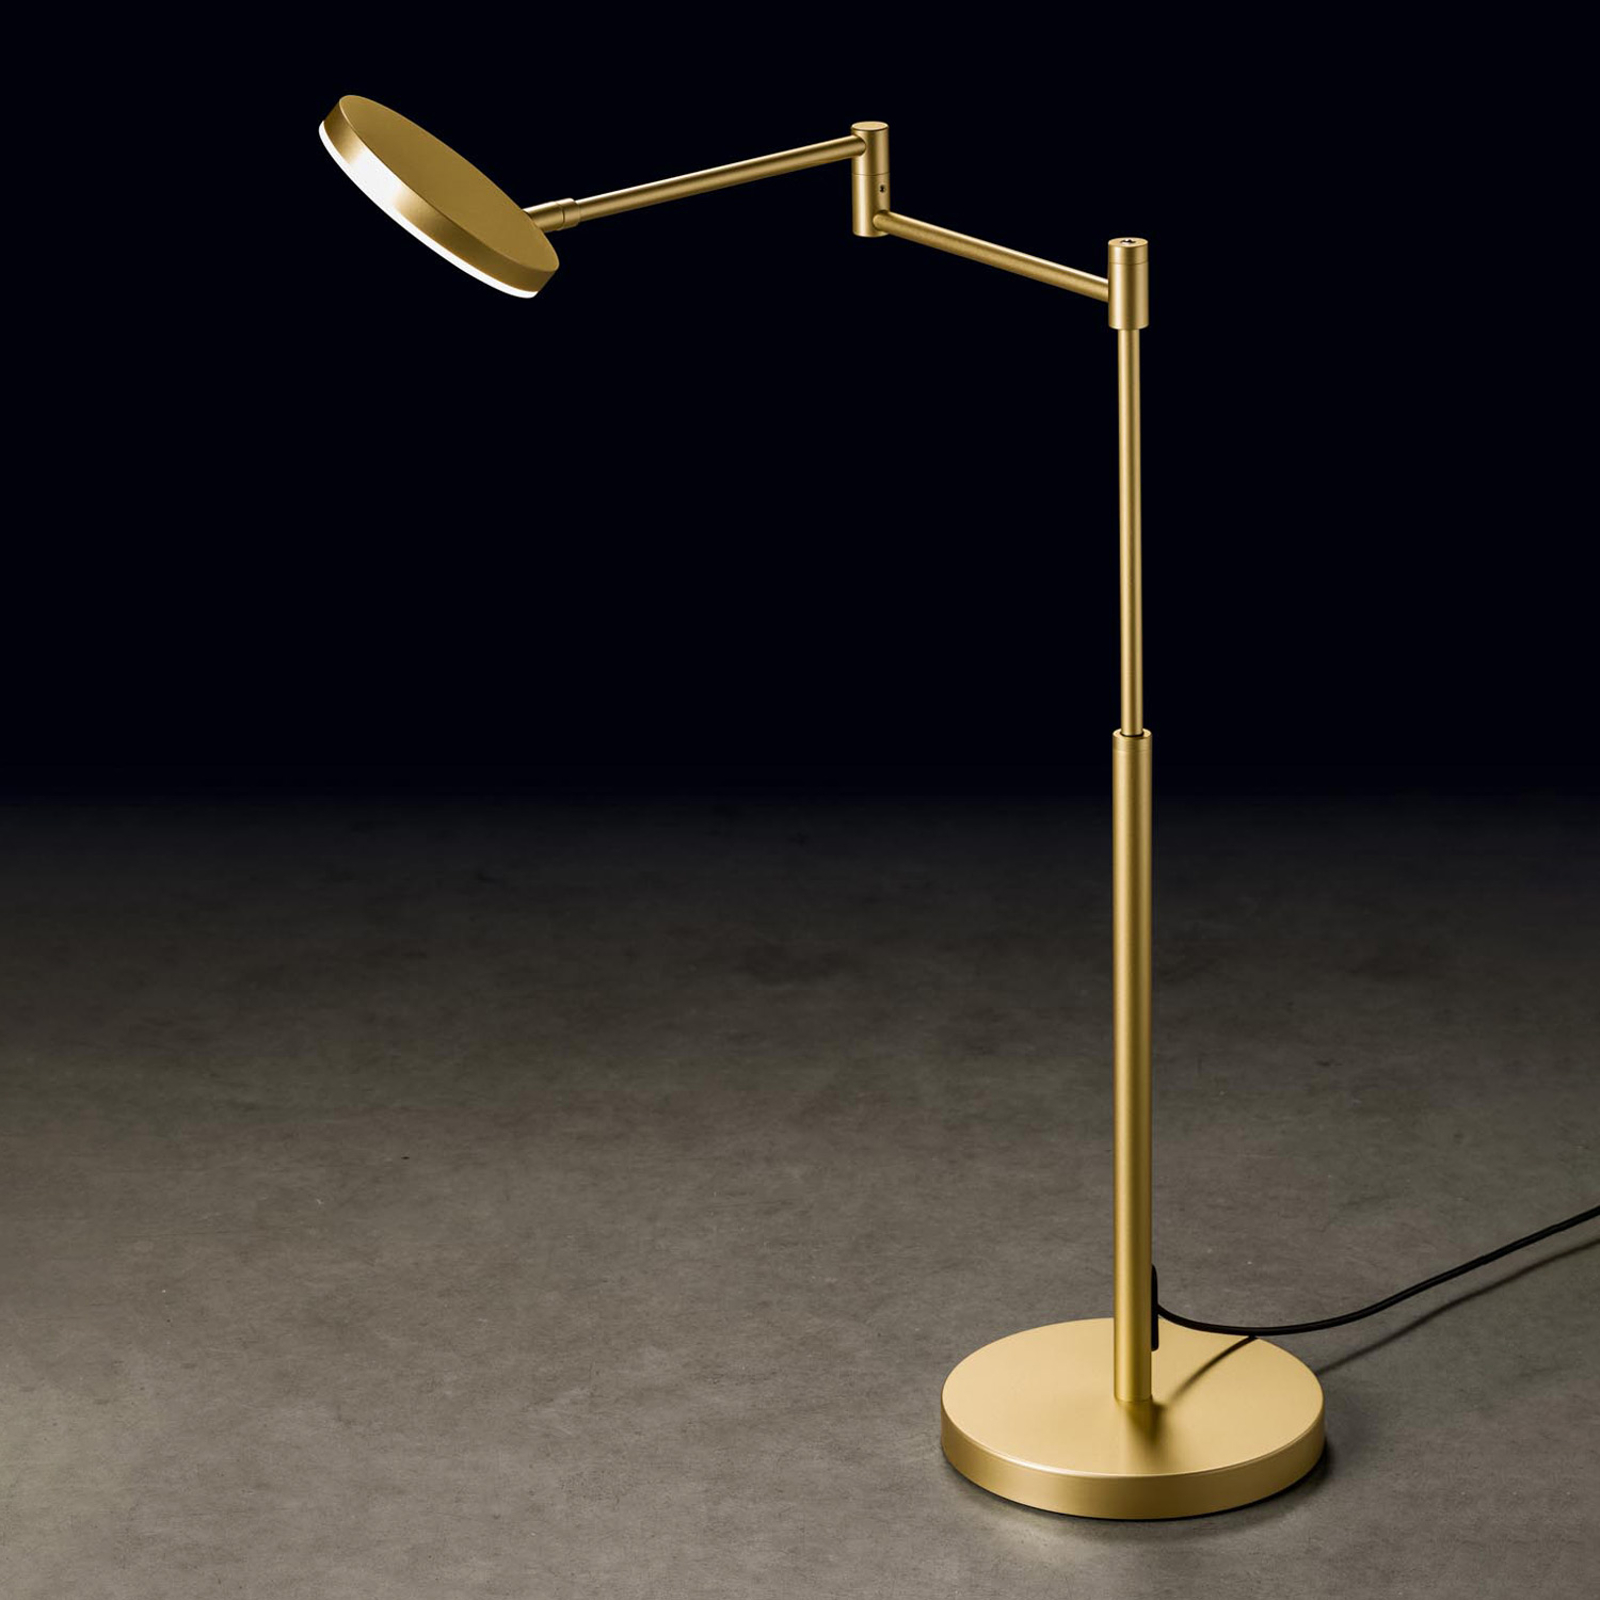 Holtkötter Plano T lampa stołowa LED mosiądz